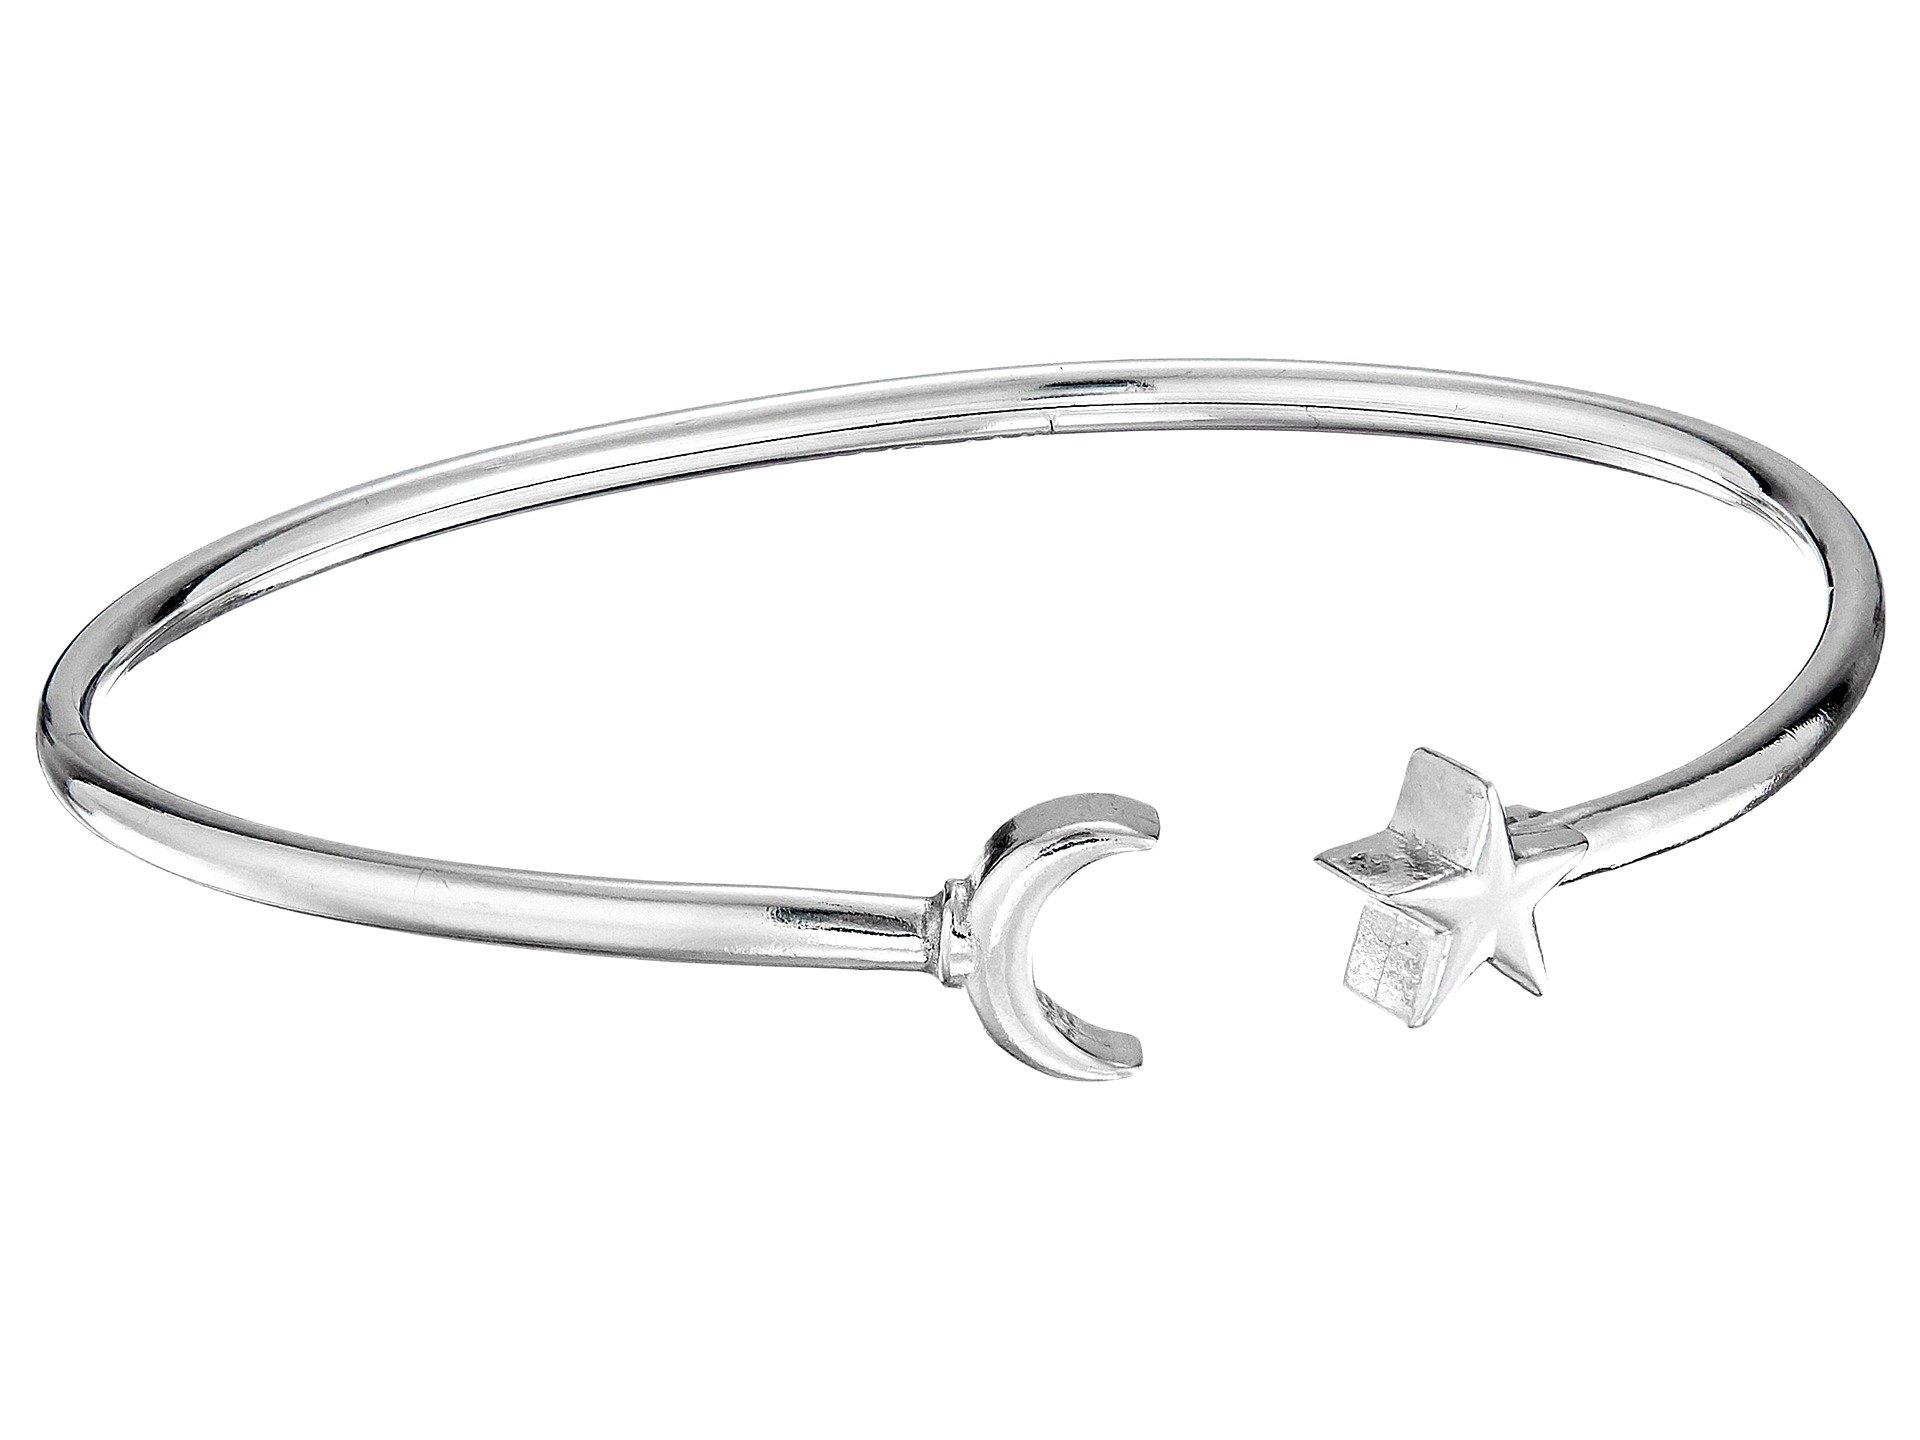 ani anchor finish alex plu and charm bracelets infinity rafaelian caymancode gold discontinued bangle